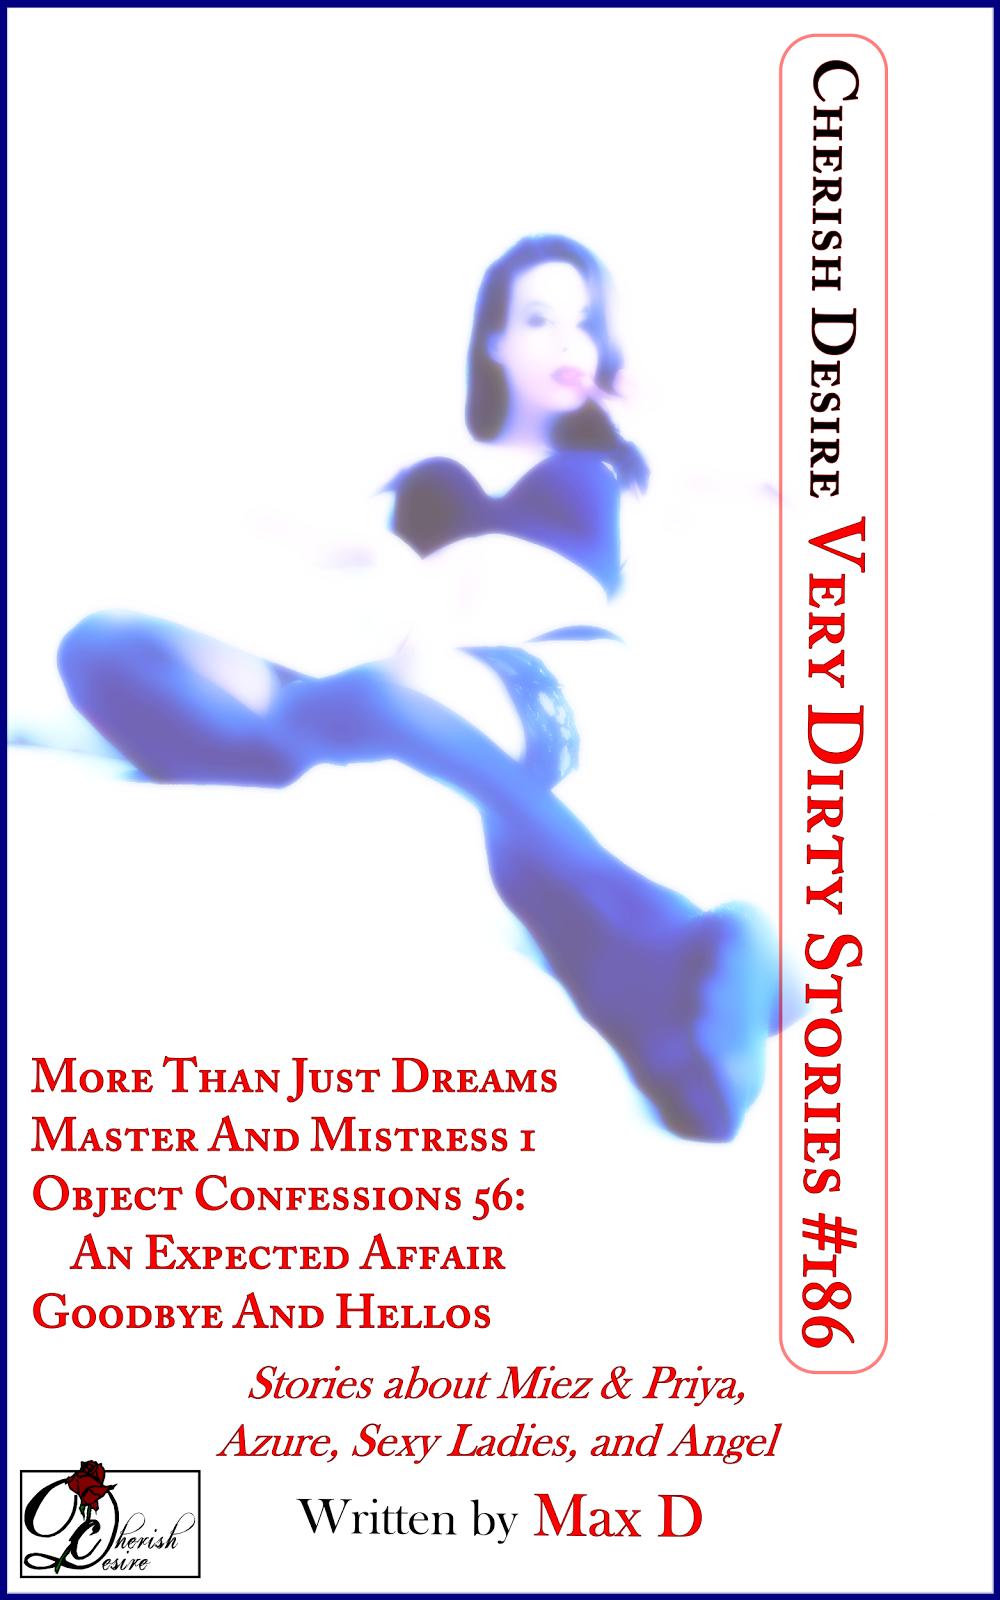 Cherish Desire: Very Dirty Stories #186, Max D, erotica